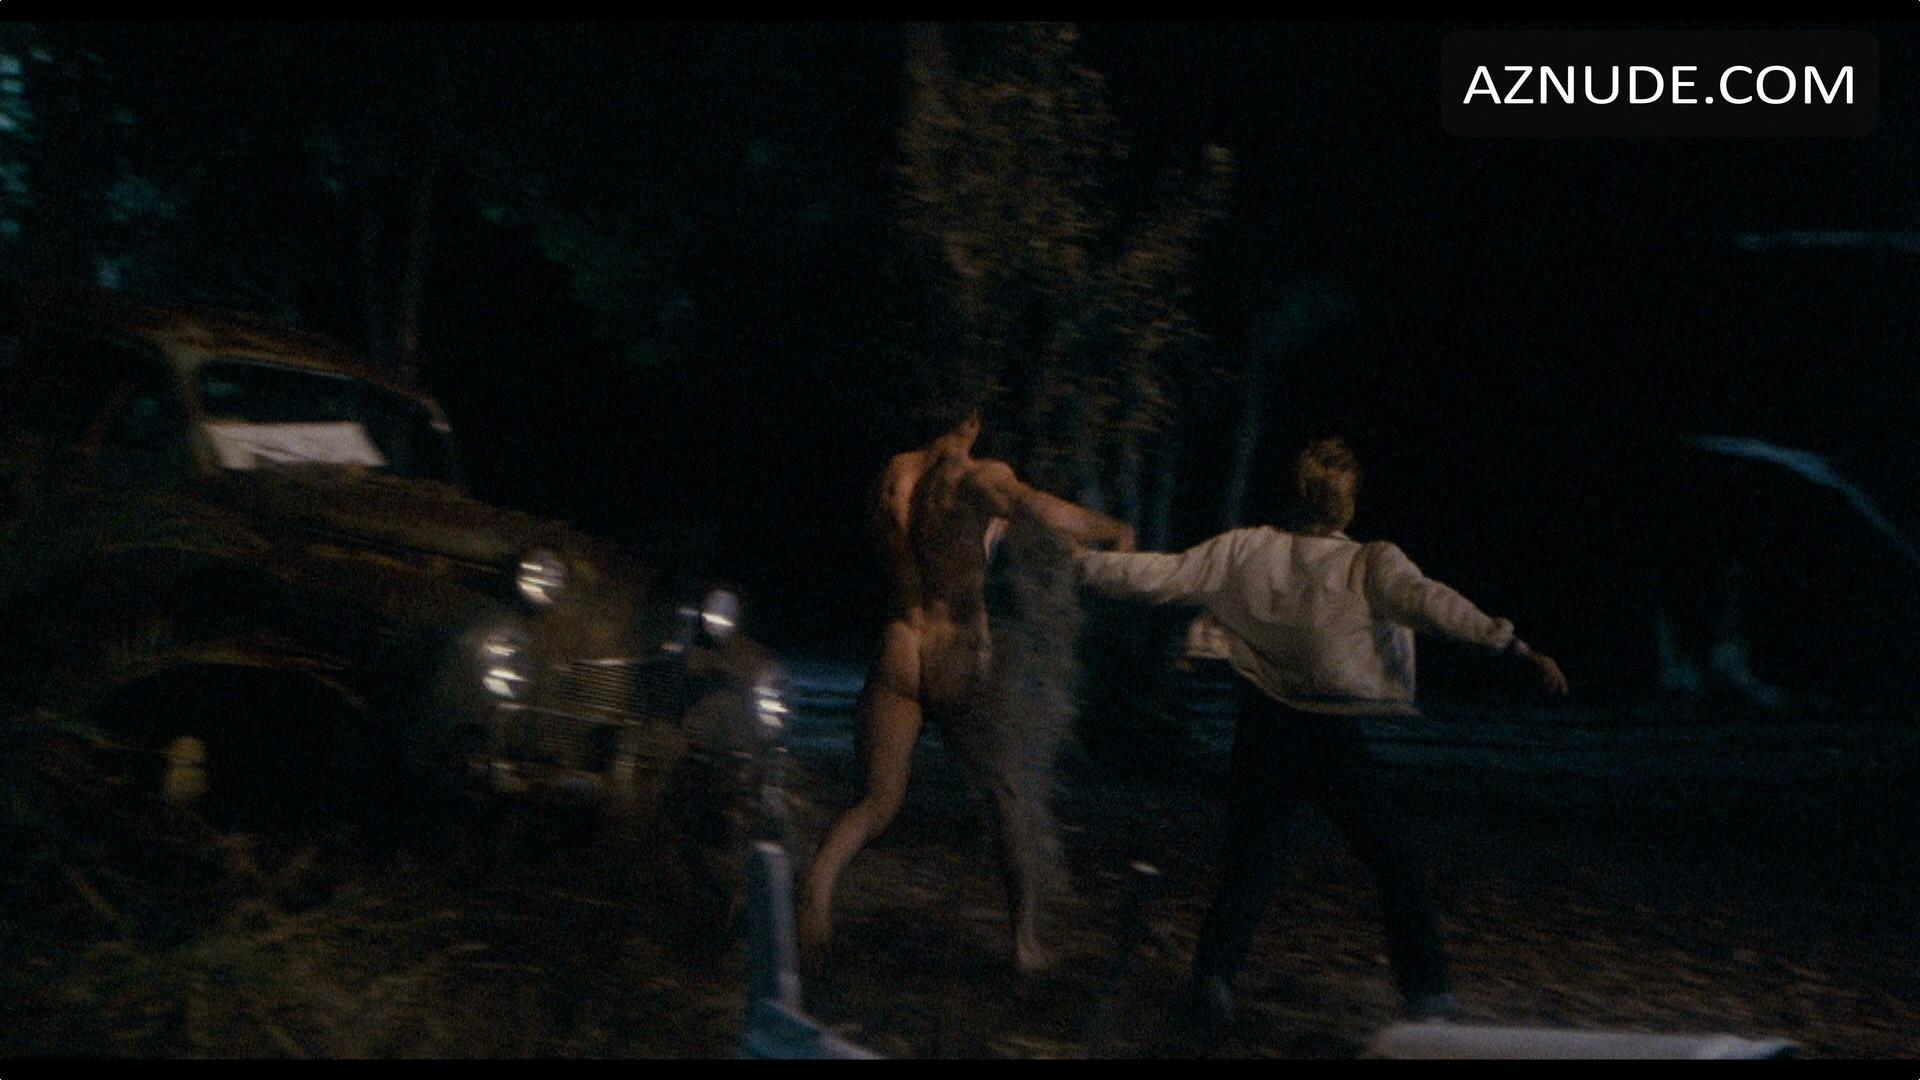 star trek sex scenes